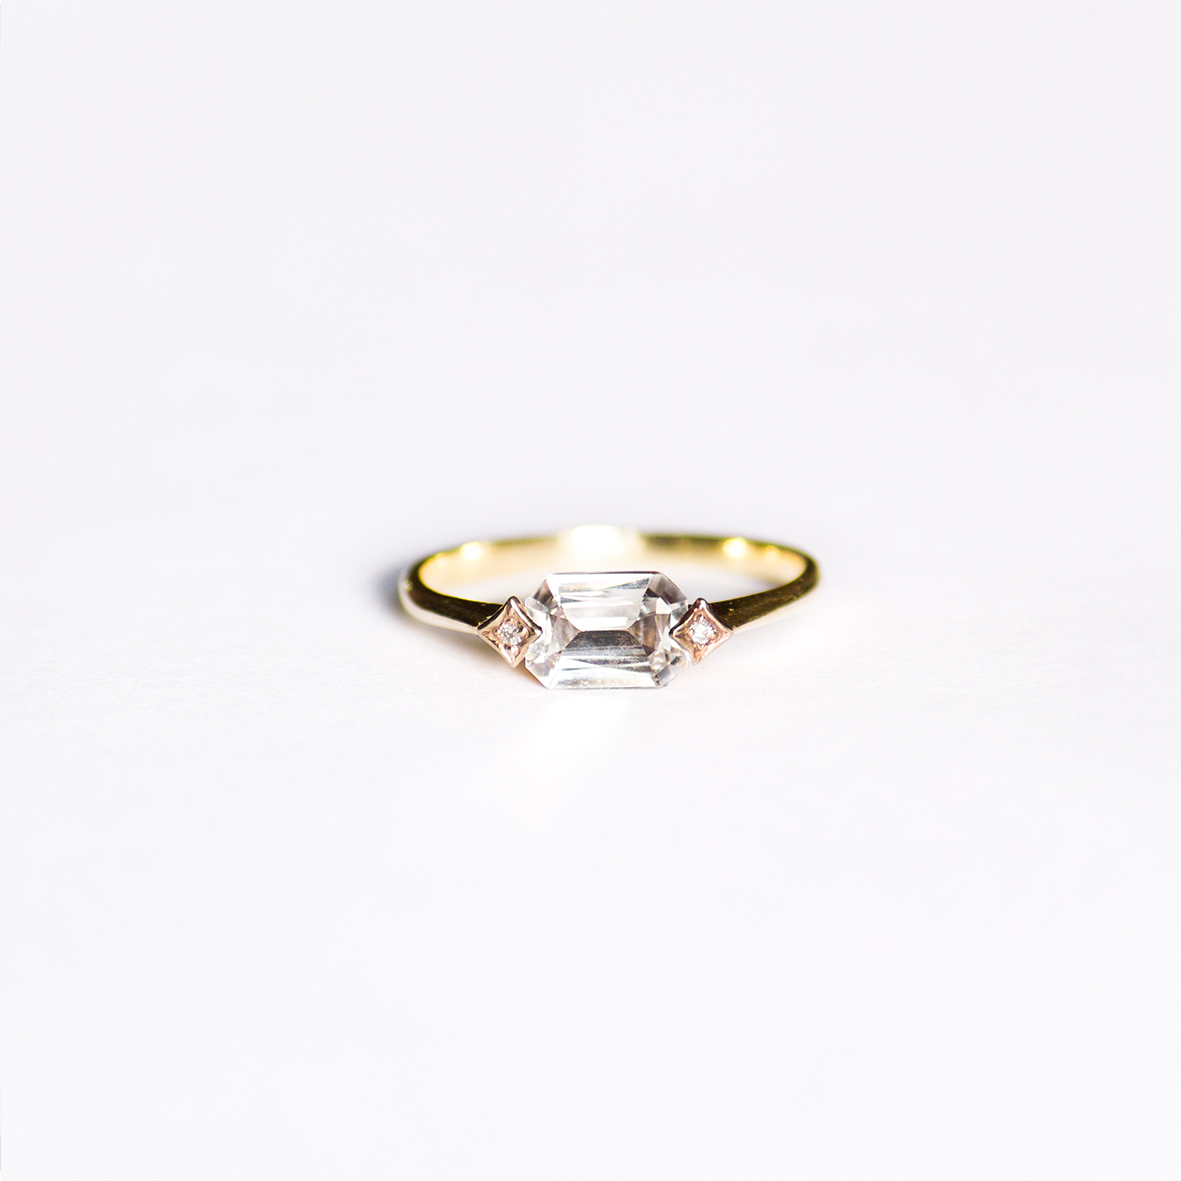 5. OONA_engagement_principal_single sapphire ring copia